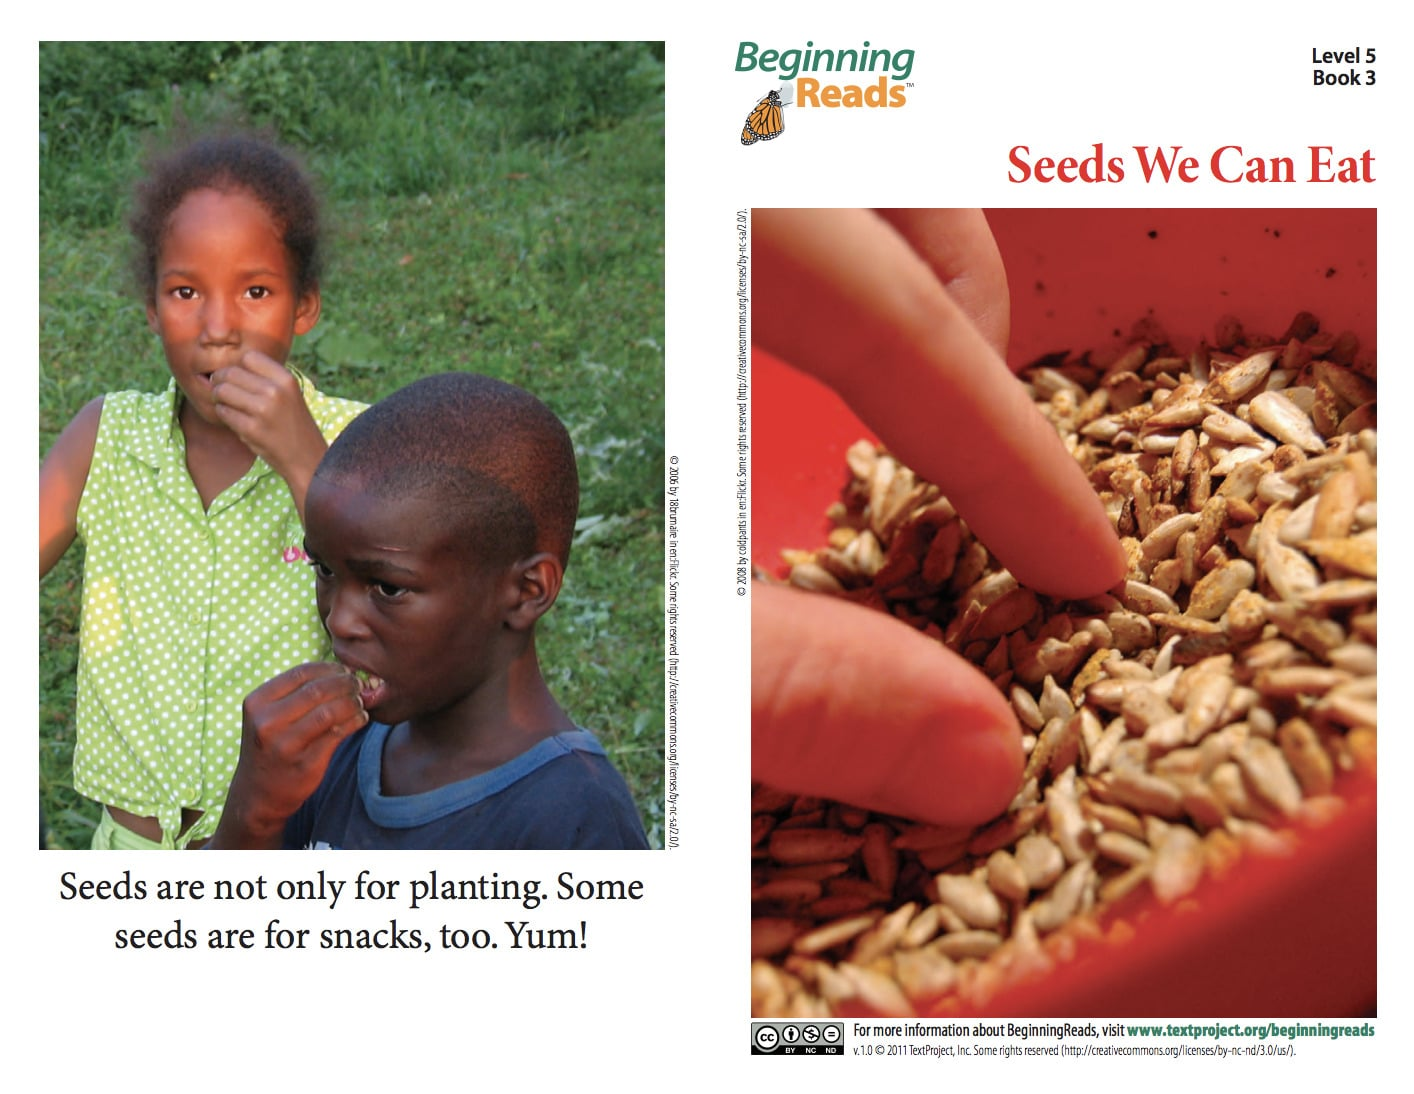 BeginningReads - seeds we can eat